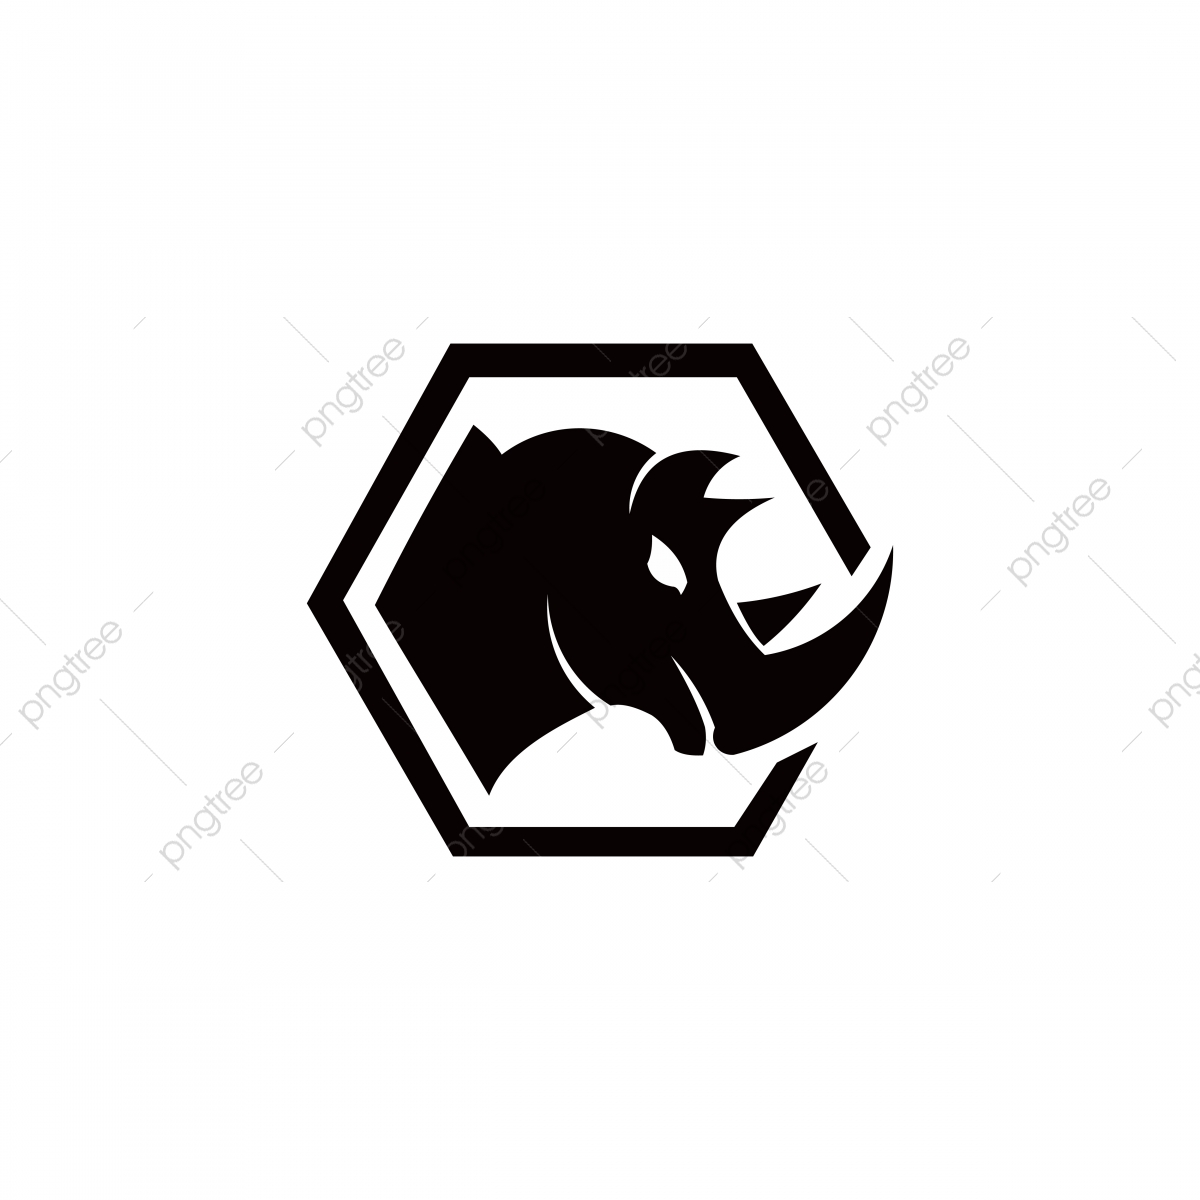 Rhinoceros Vector Silhouette Illustration Isolated On White